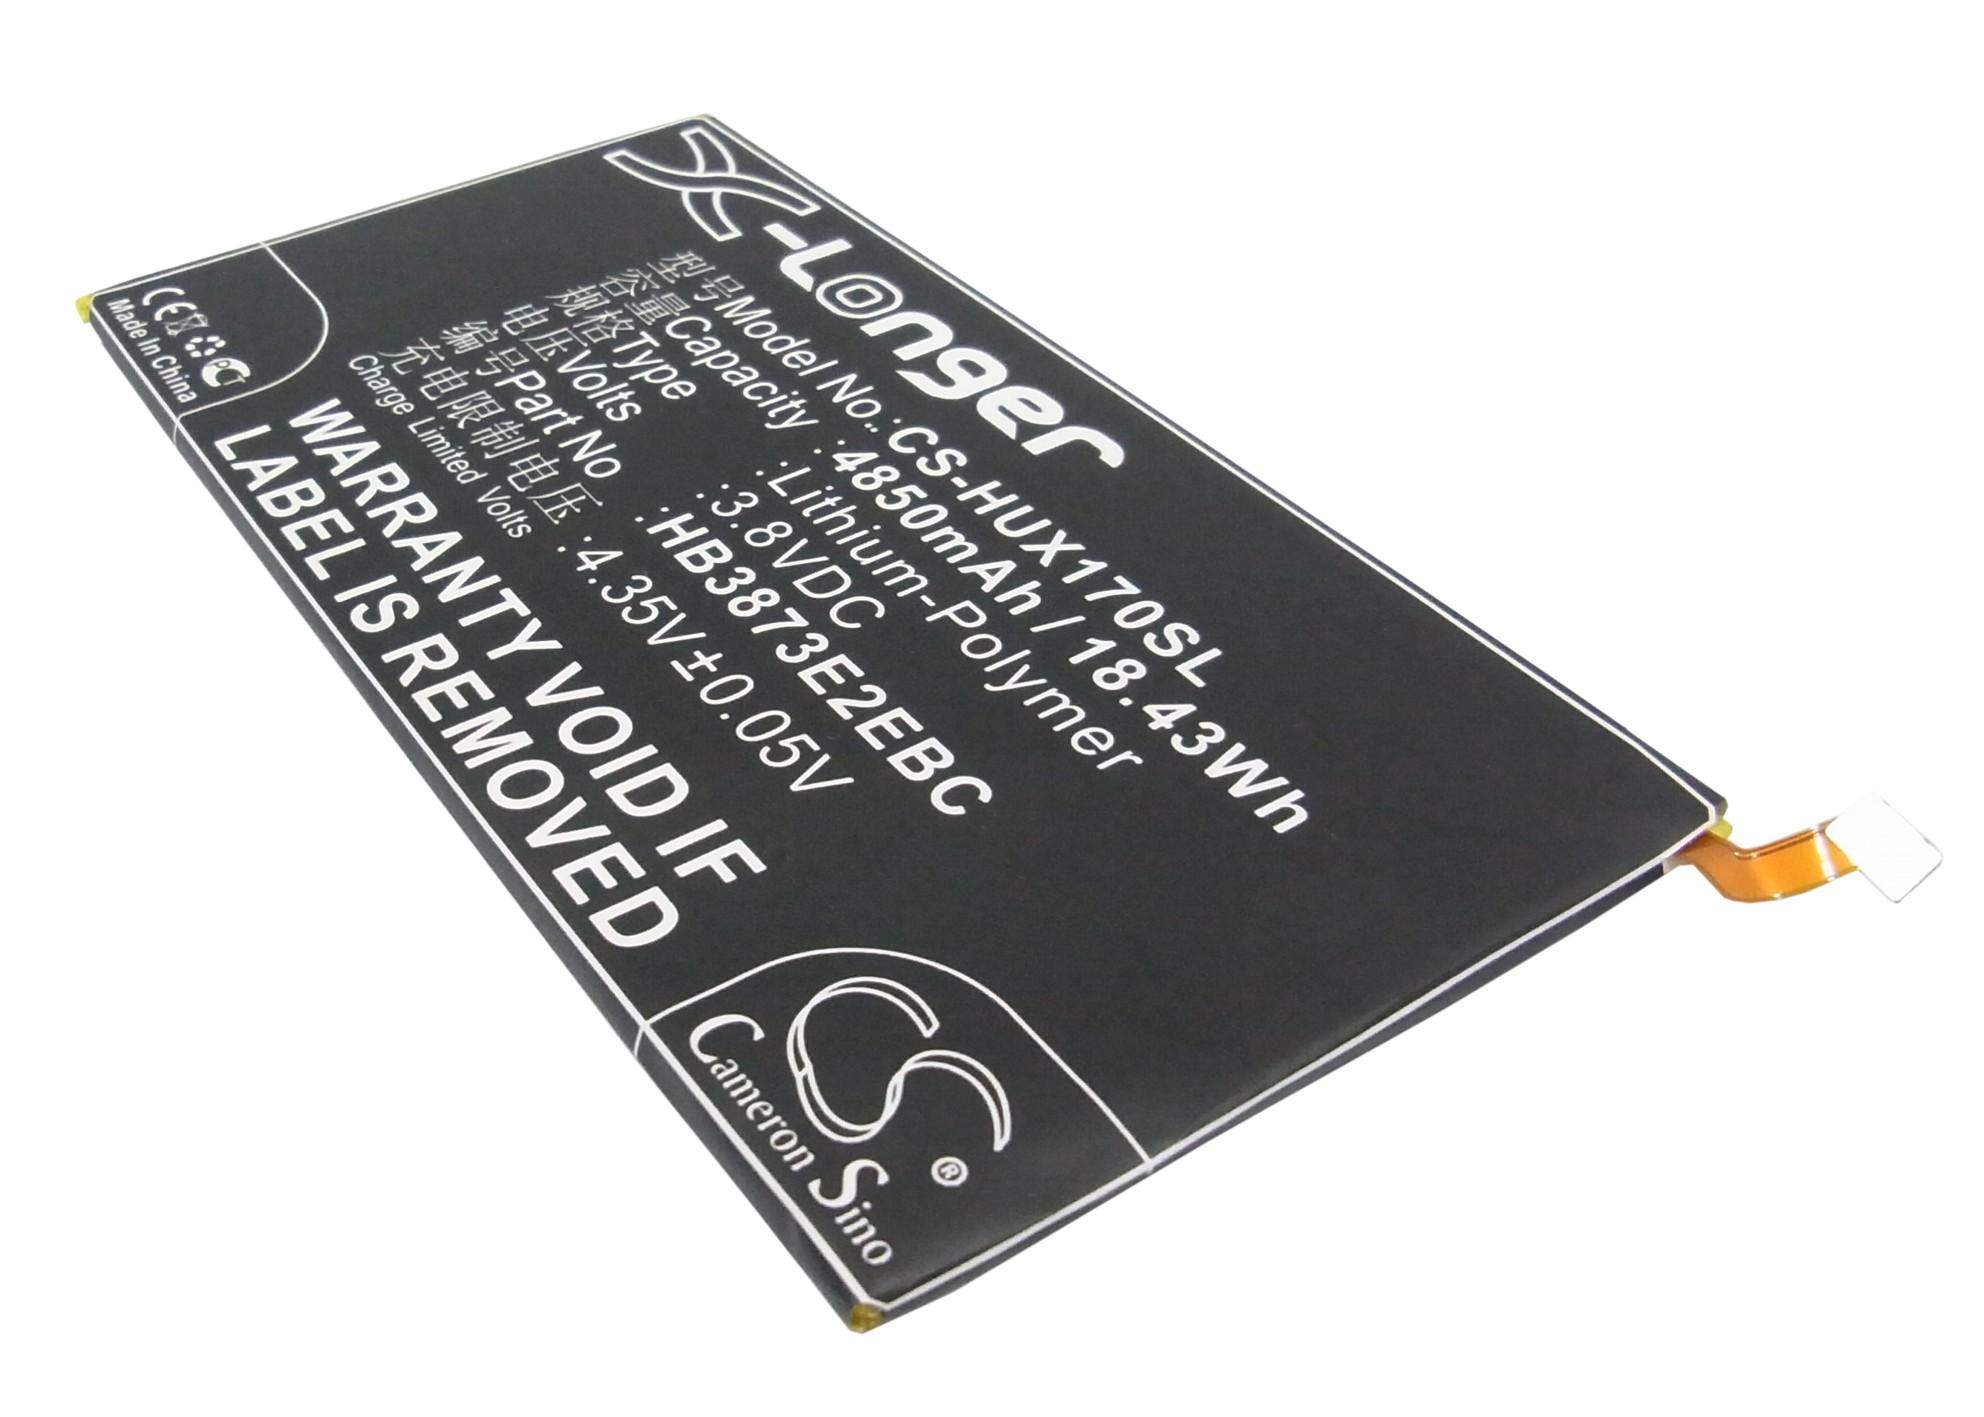 Cameron Sino baterie do tabletů pro HUAWEI Mediapad X1 7.0 LTE 3.8V Li-Polymer 4850mAh černá - neoriginální